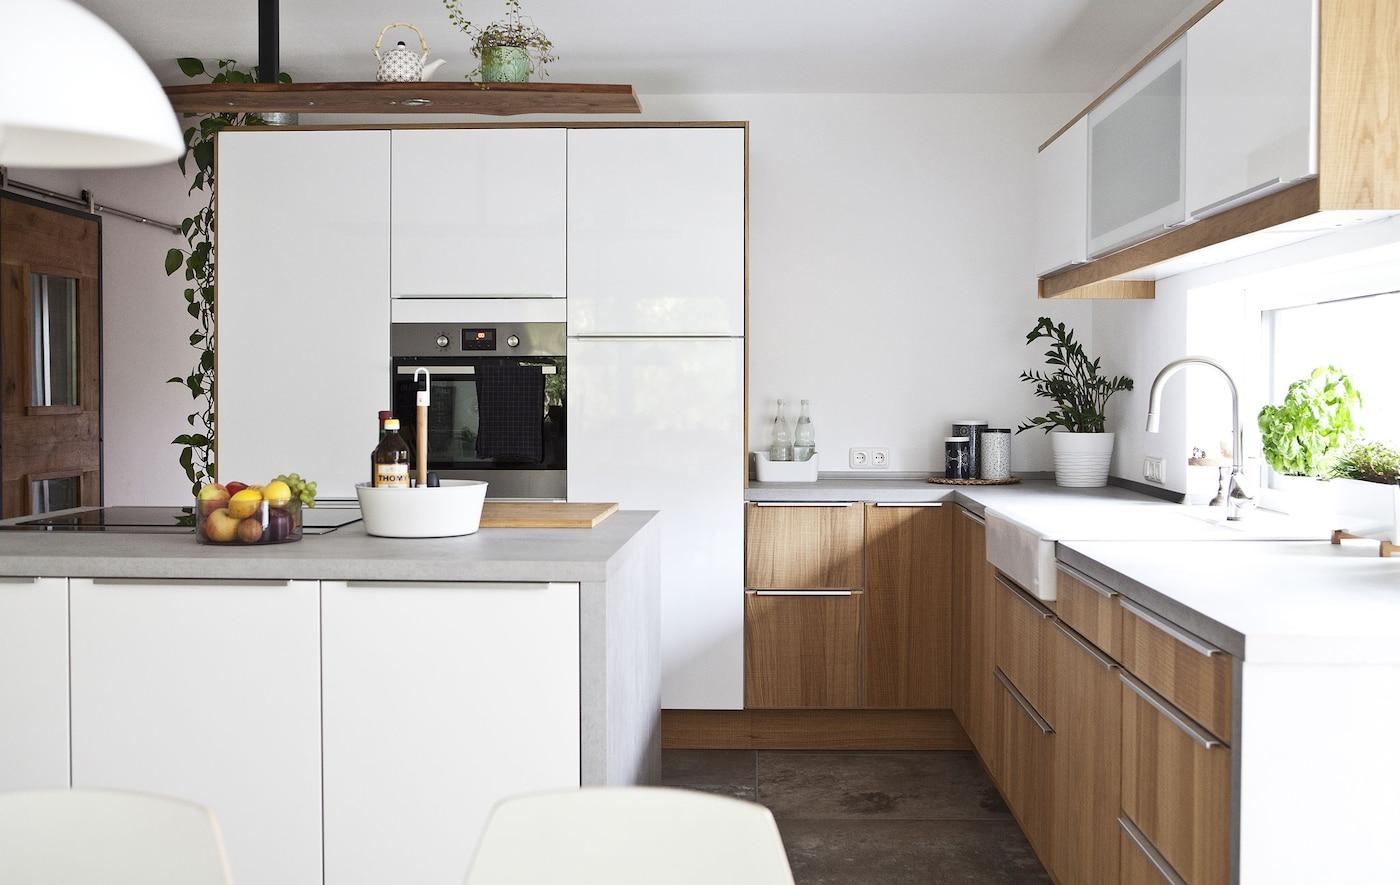 k che modern gestalten dekorieren ikea. Black Bedroom Furniture Sets. Home Design Ideas